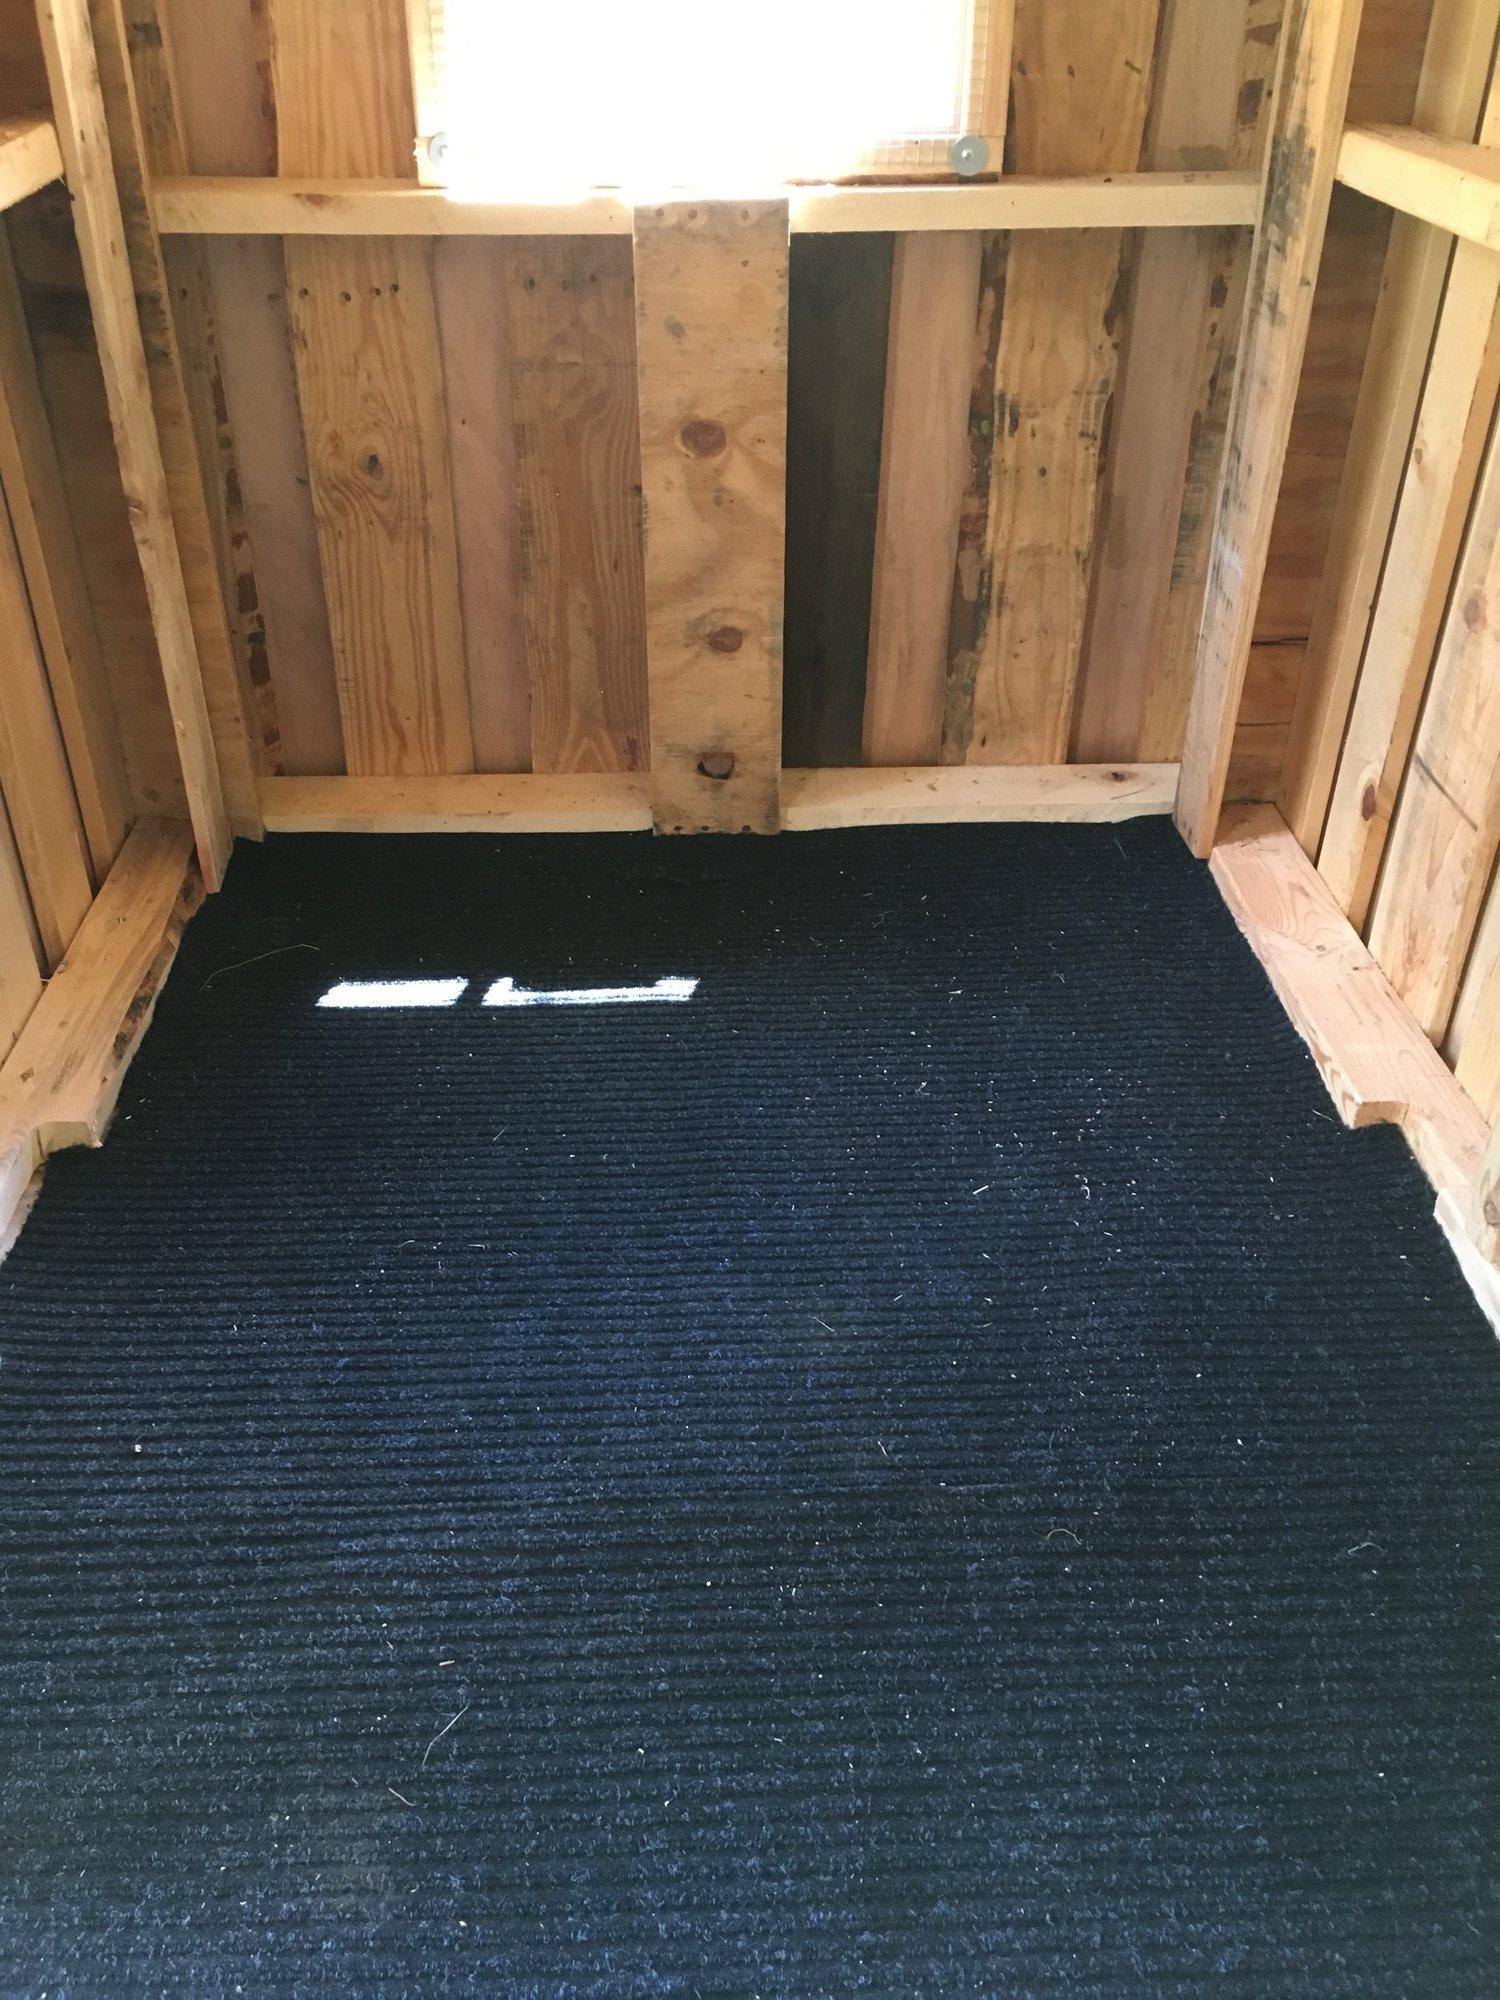 19-coop floor mat lining.jpeg